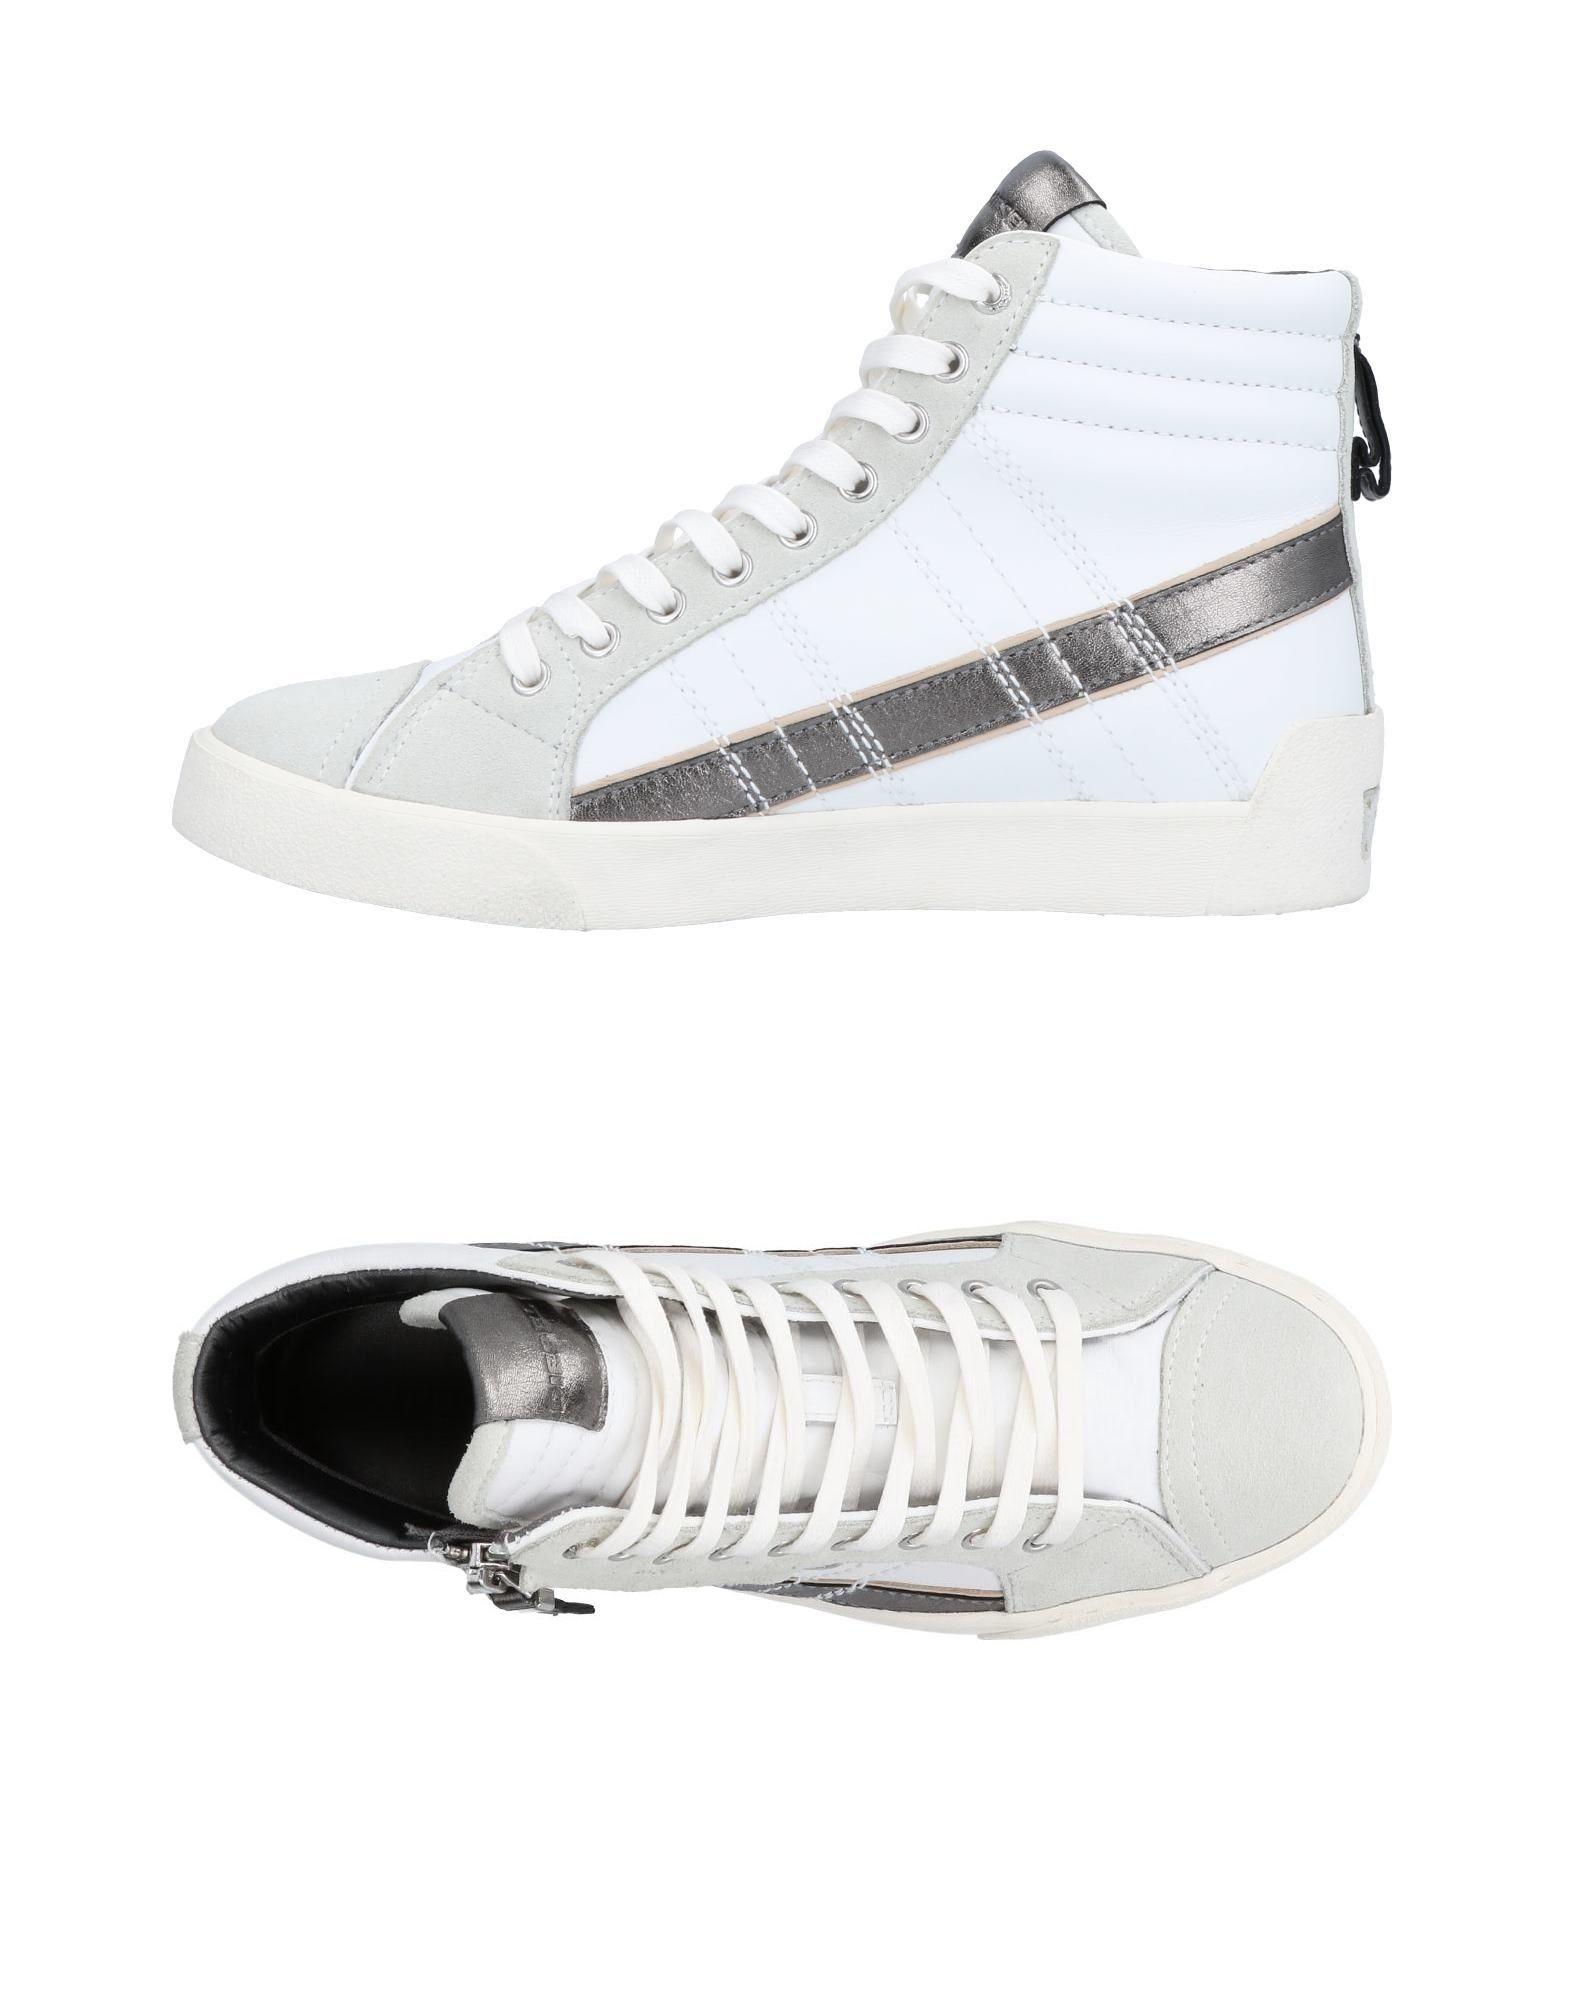 Diesel Sneakers Damen  11491227JK Gute Qualität beliebte Schuhe